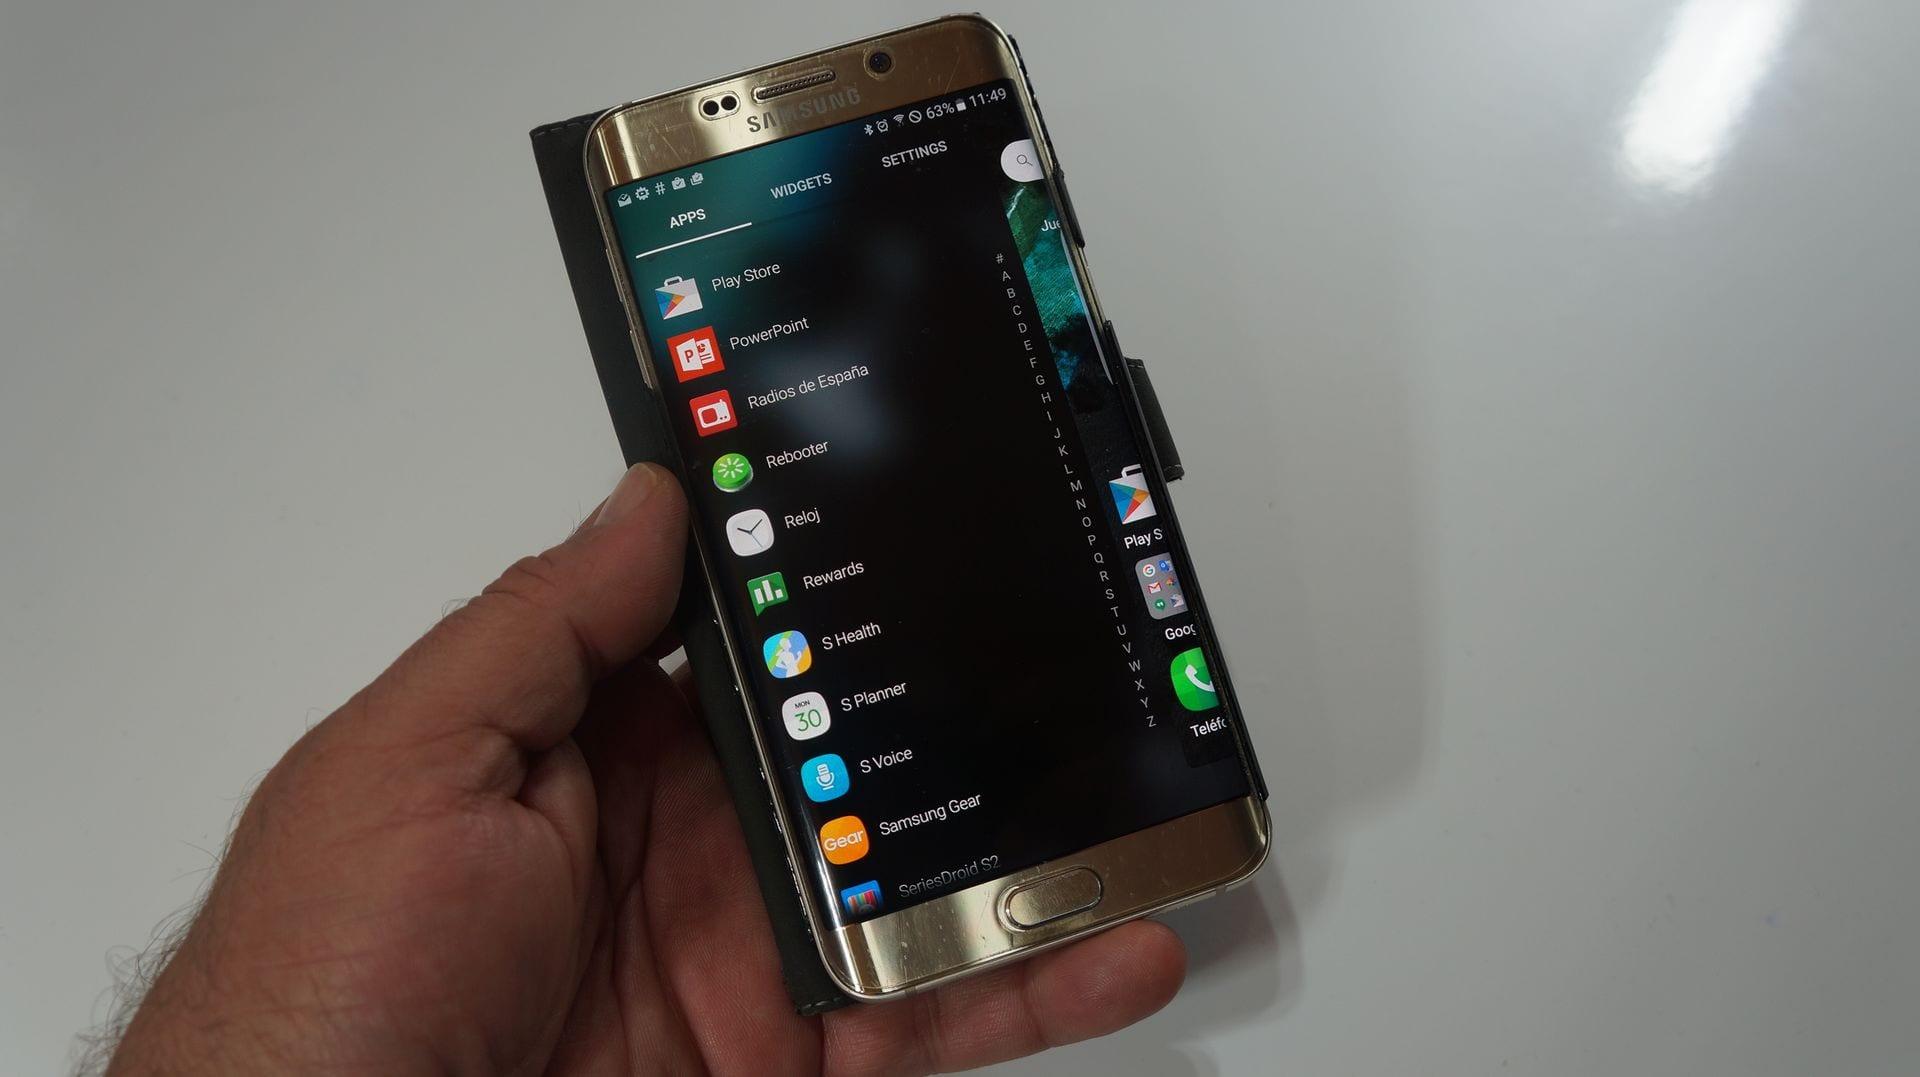 Evie Launcher un nuevo Launcher Android totalmente gratuito que te va a encantar